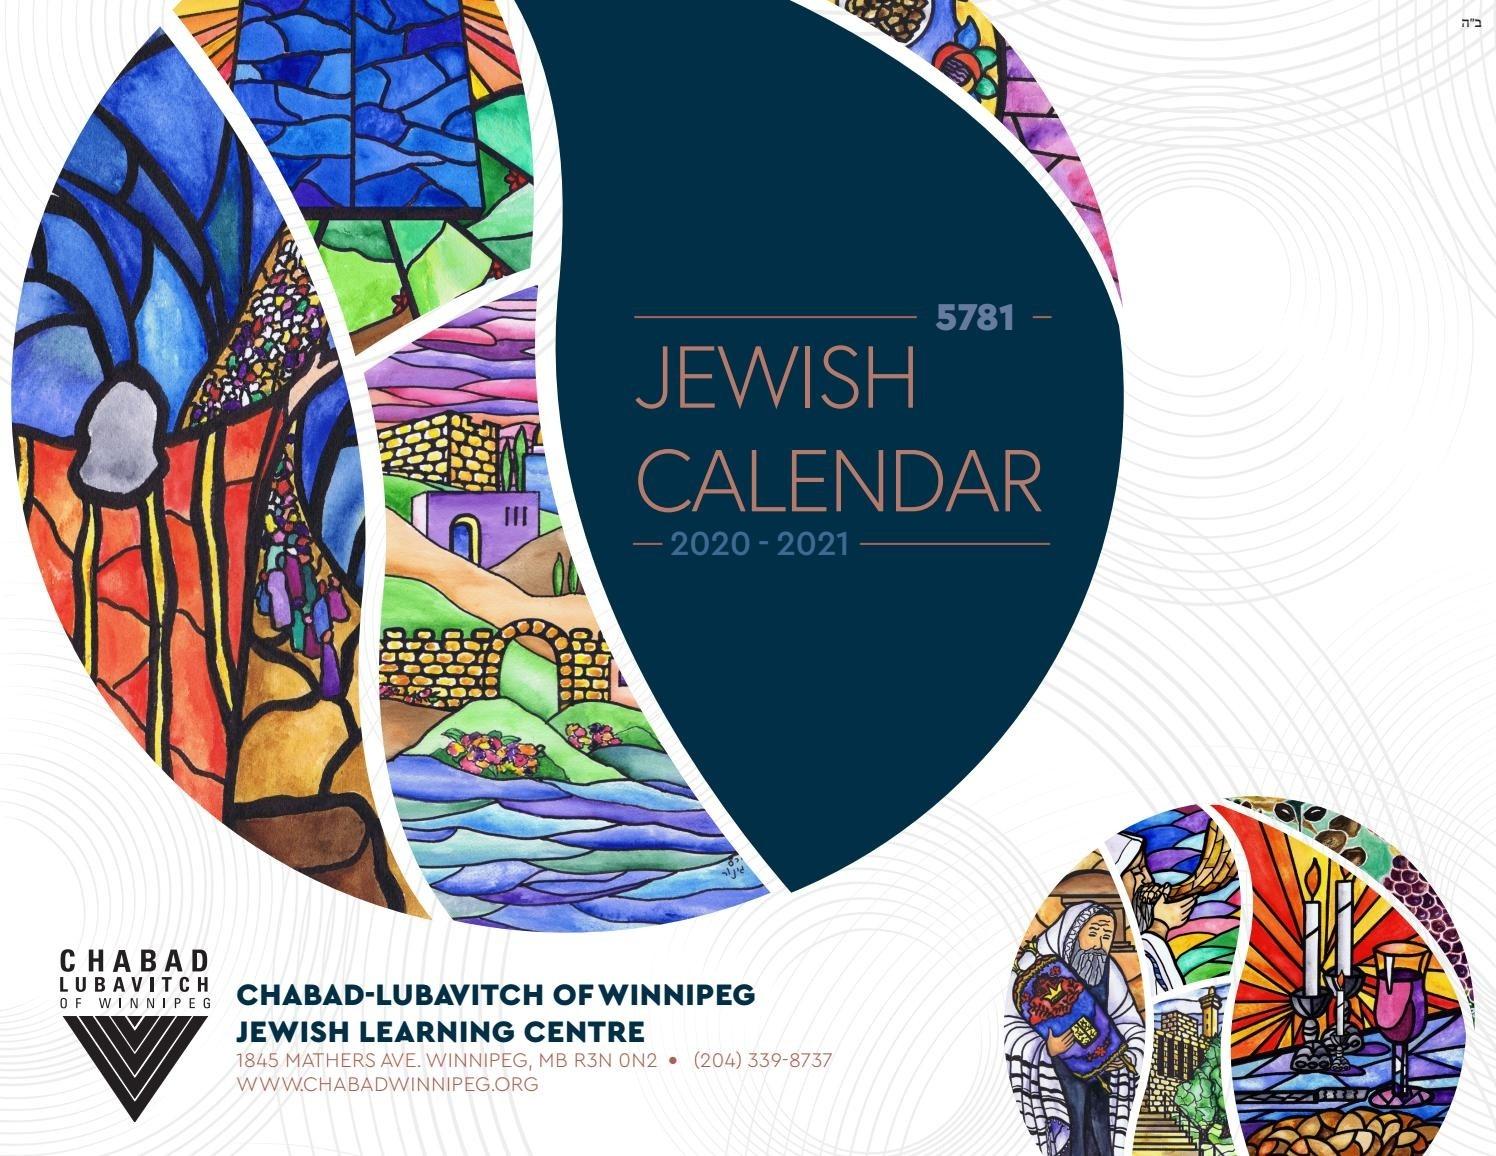 Jewish Calendar 5781 By Chabad-Lubavitch Of Winnipeg - Issuu-Jewish Calendar For October 2021